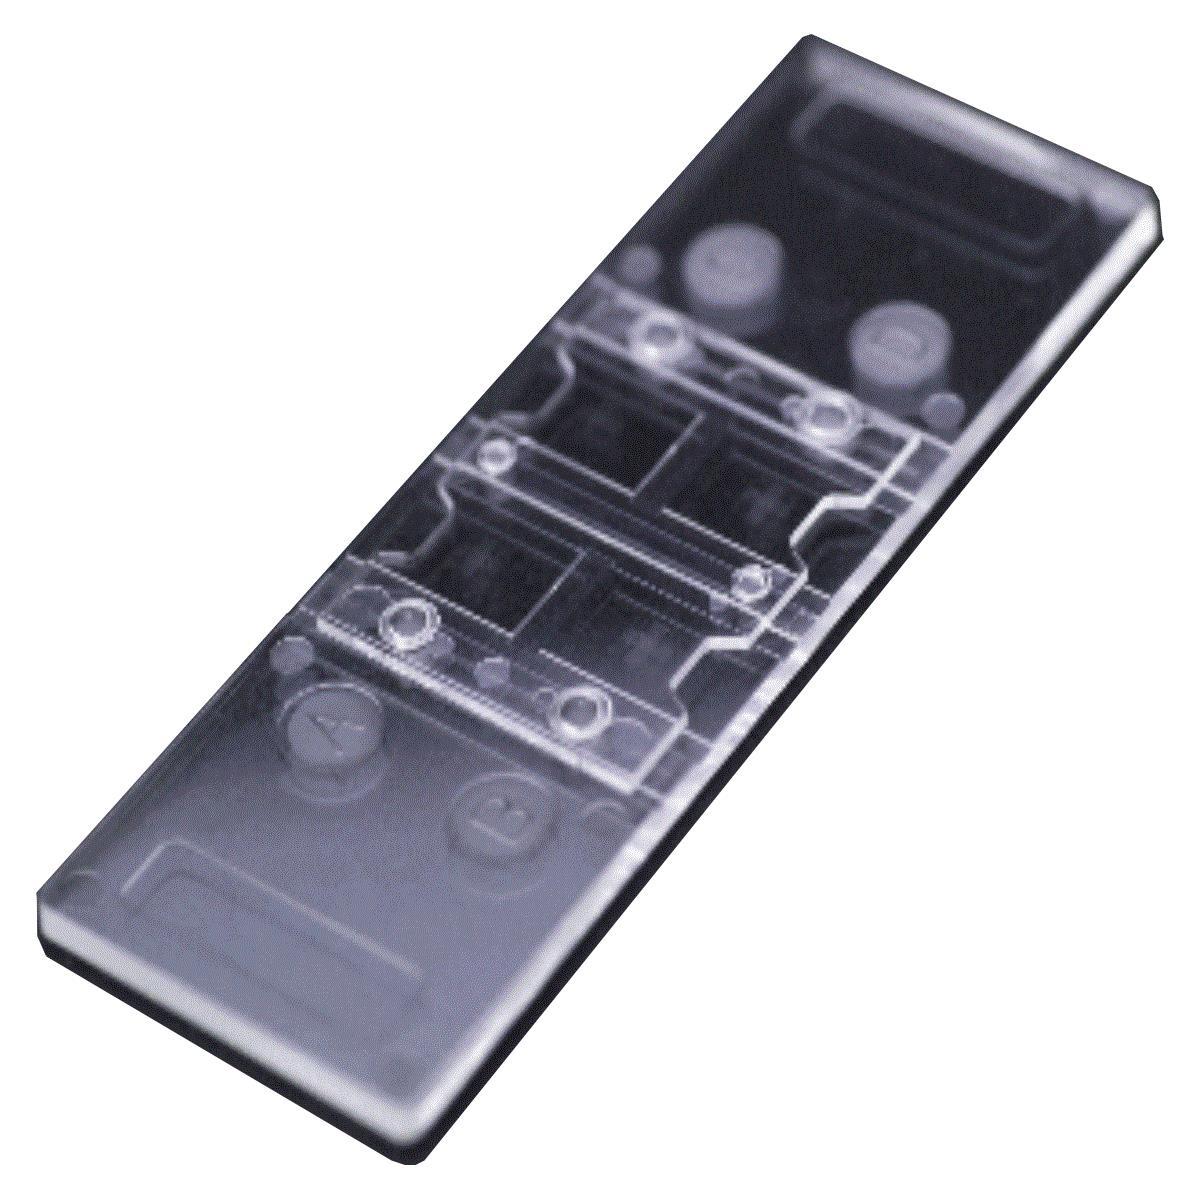 Disposable hemocytometer